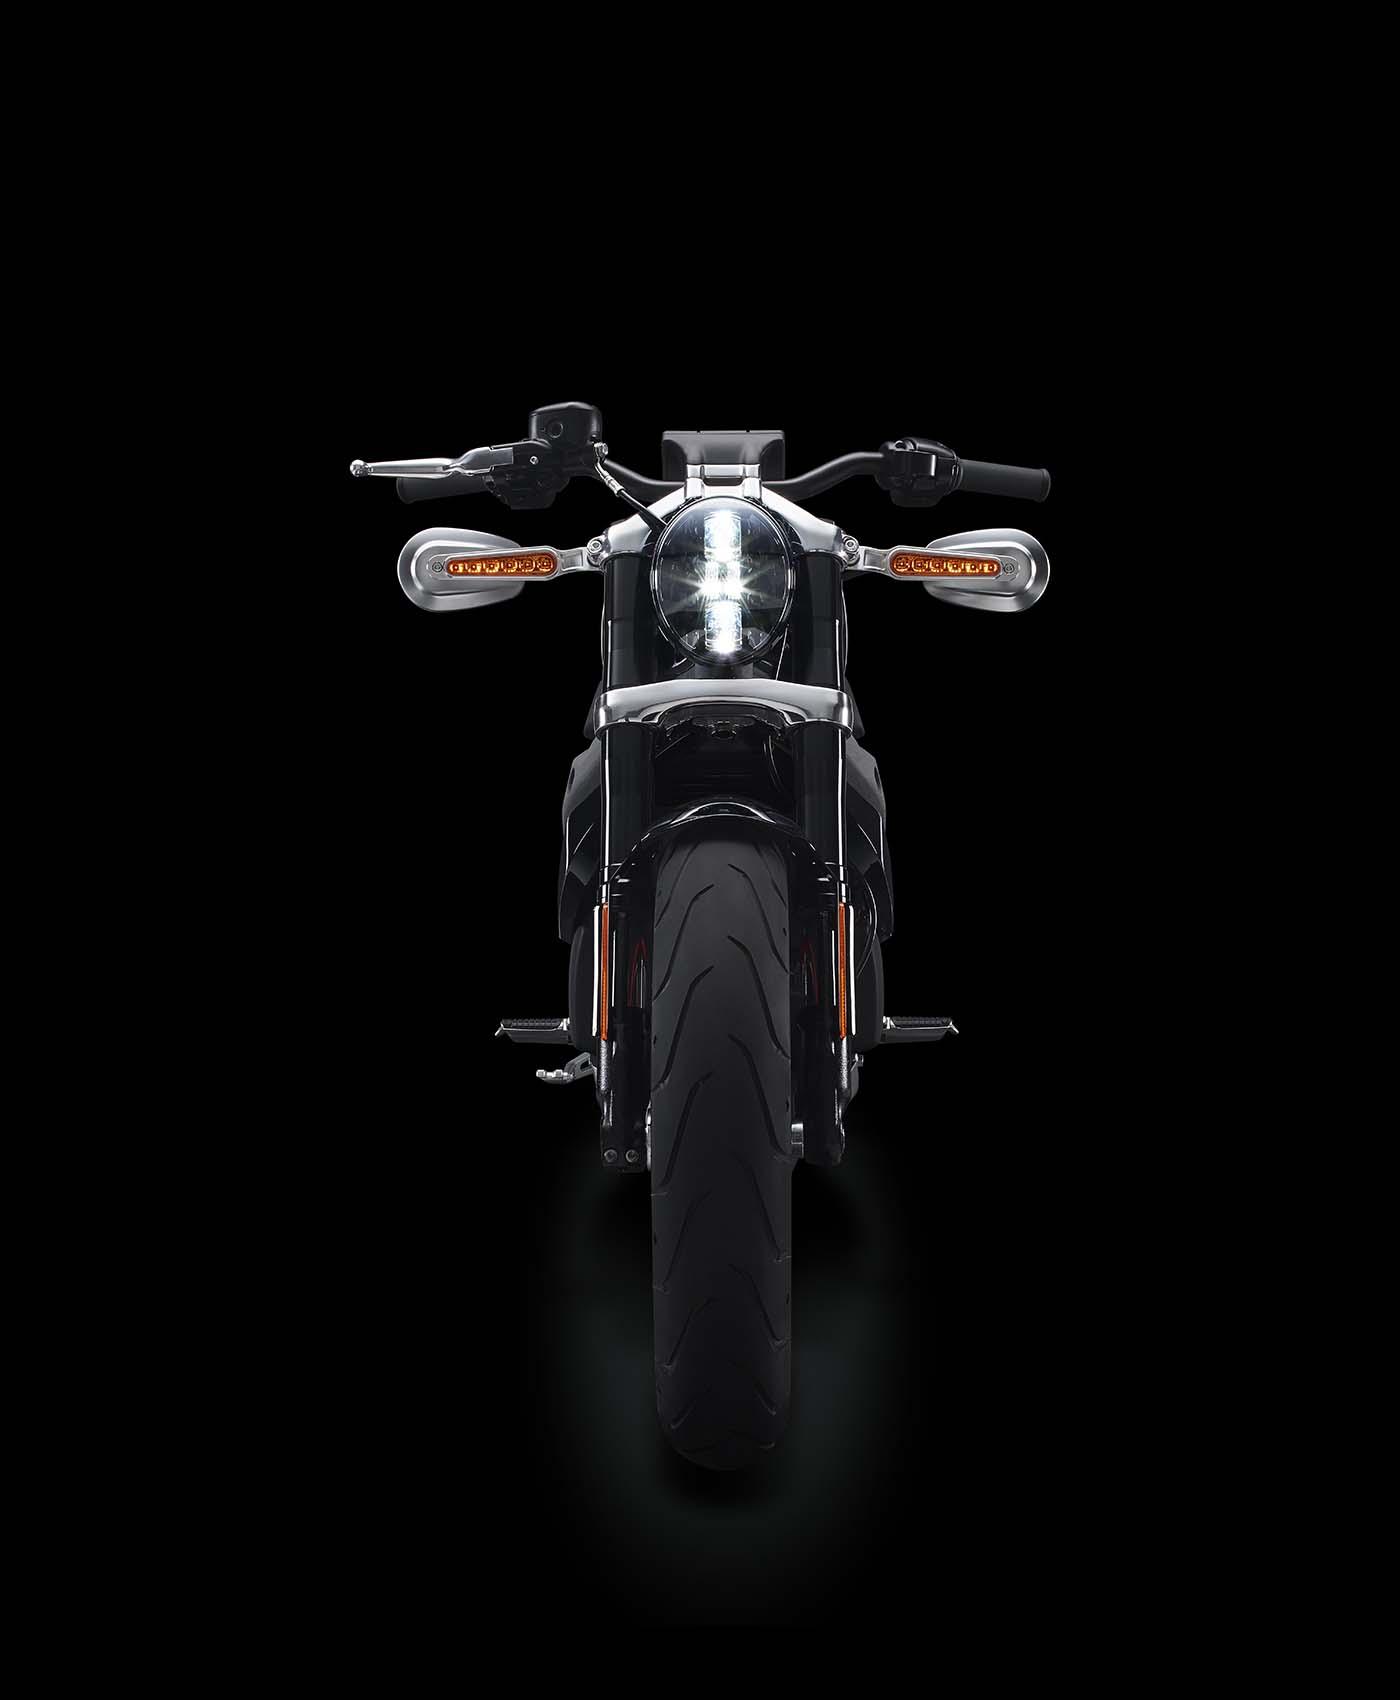 La sportive verte du futur - Page 15 Harley-Davidson-Livewire-electric-motorcycle-07